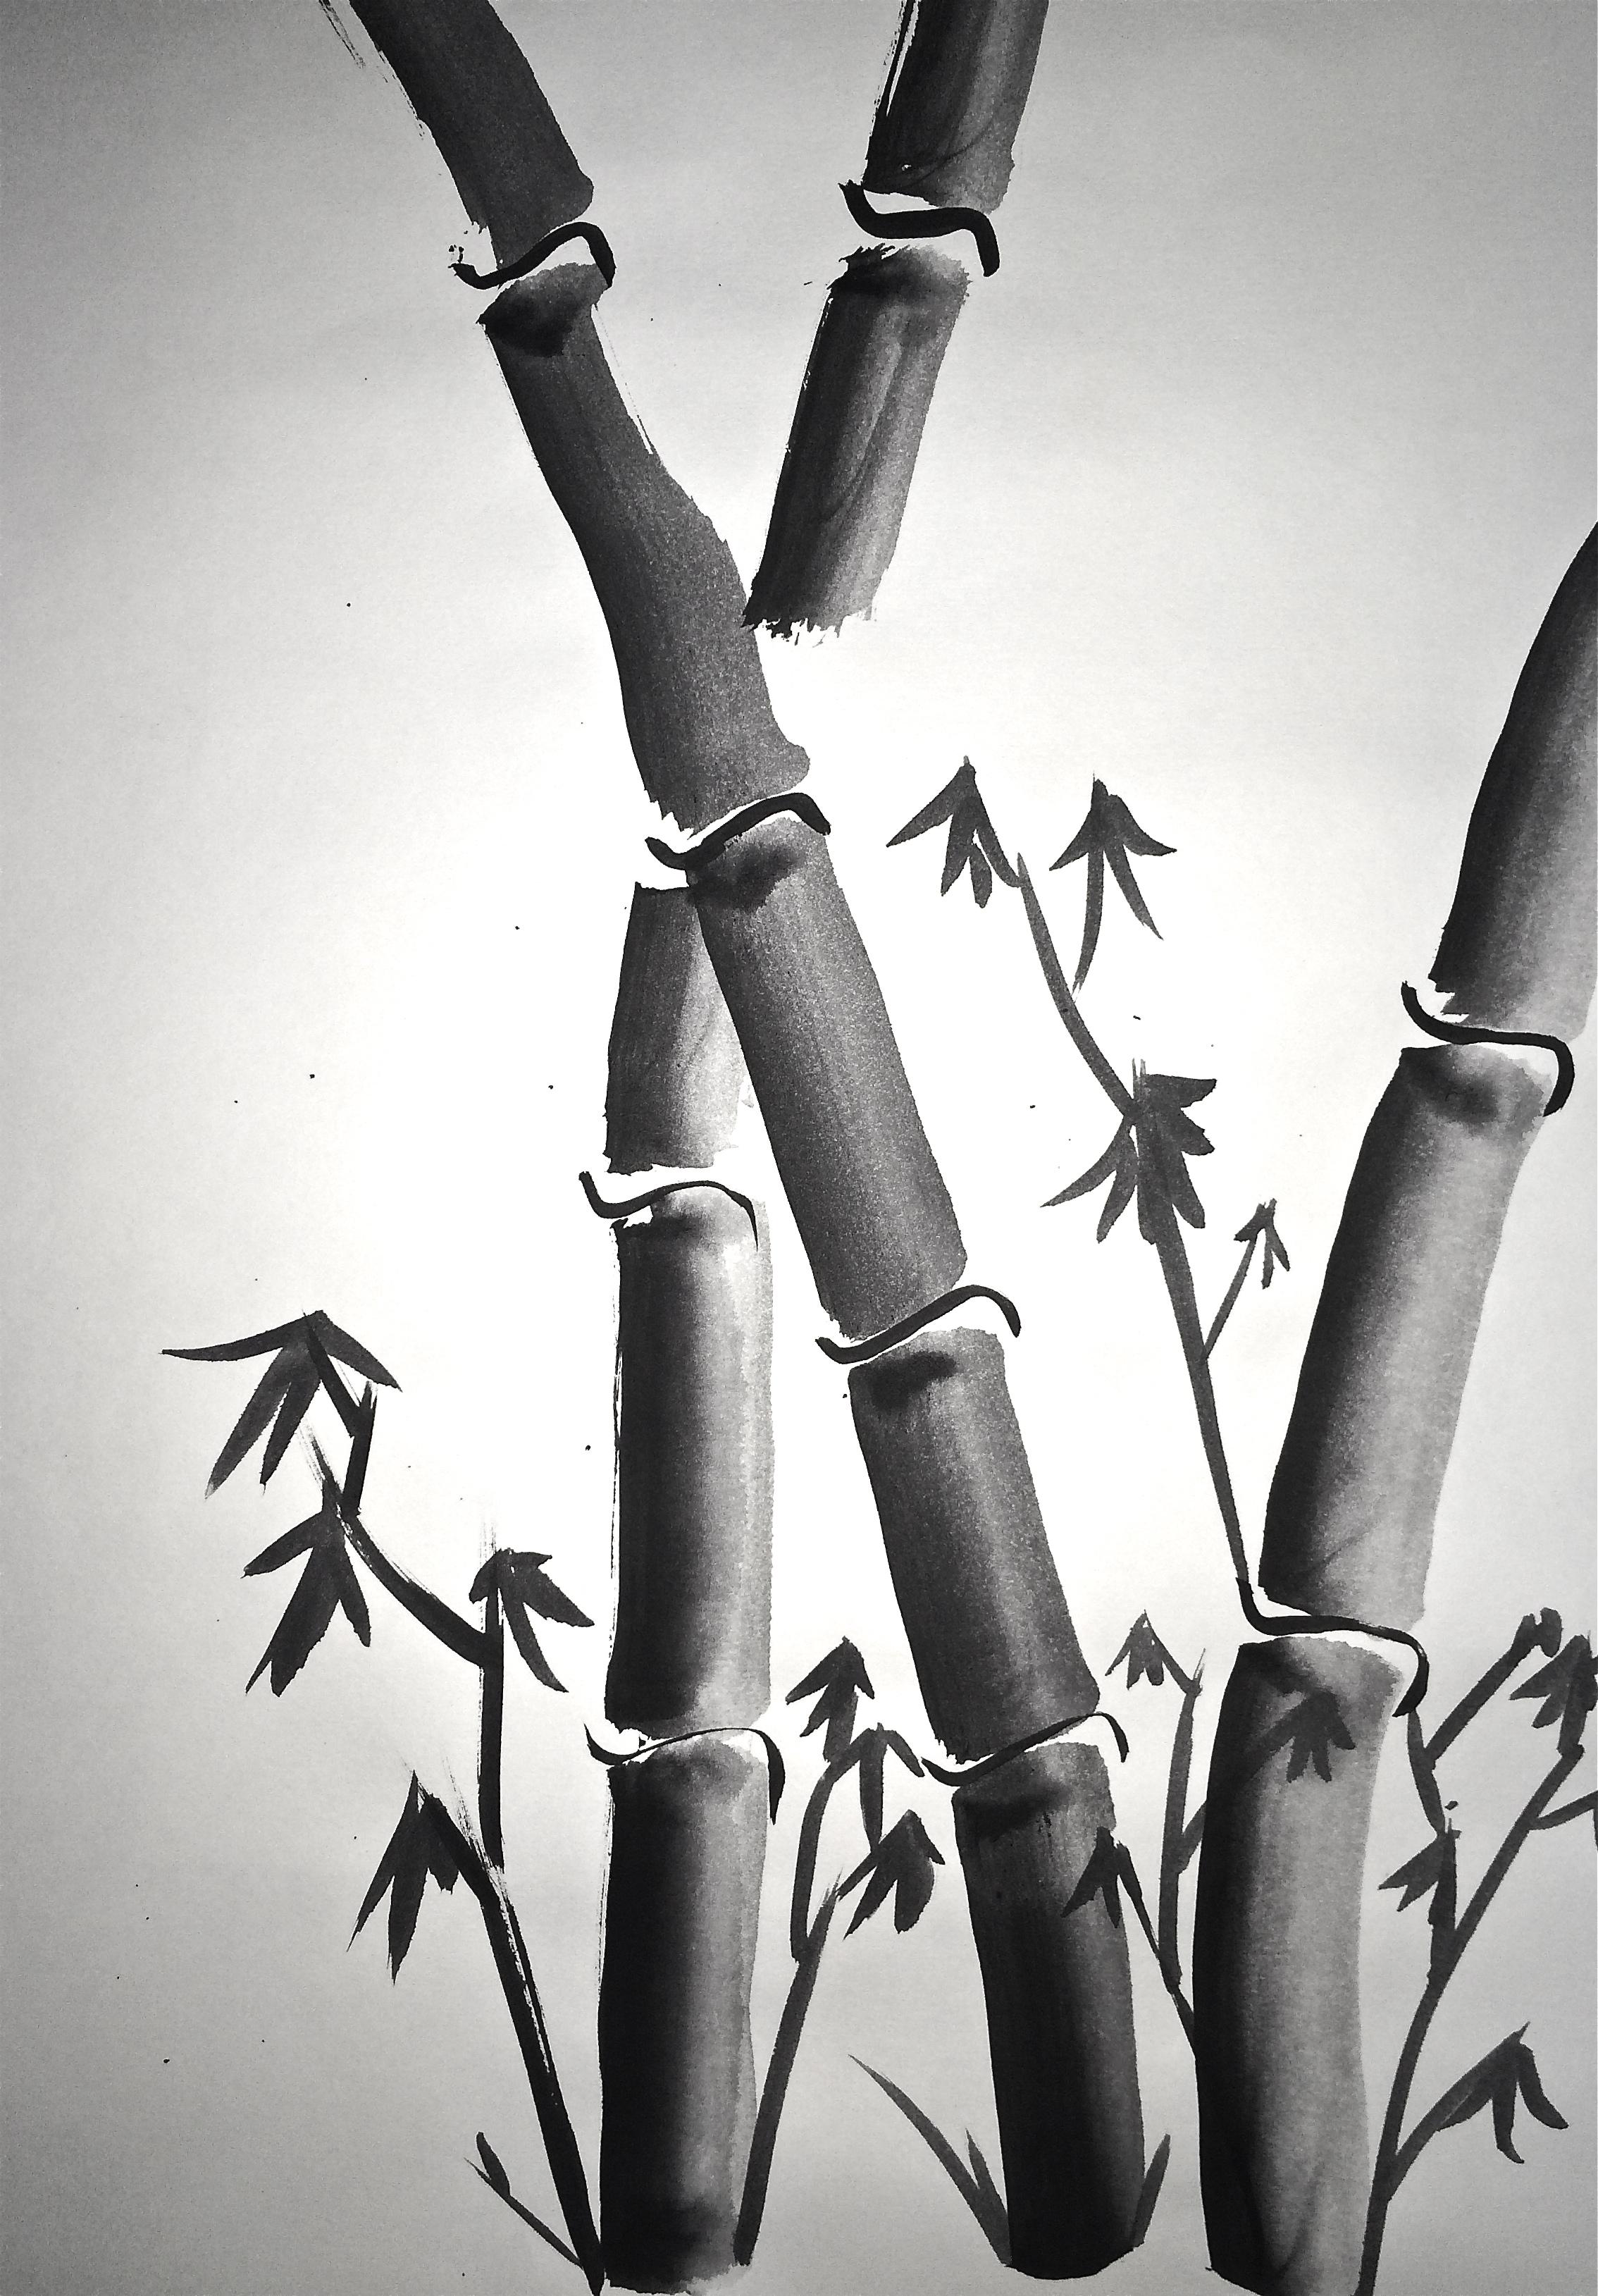 Sumi-e Painting 4 Basic Brushstrokes: Lesson 2